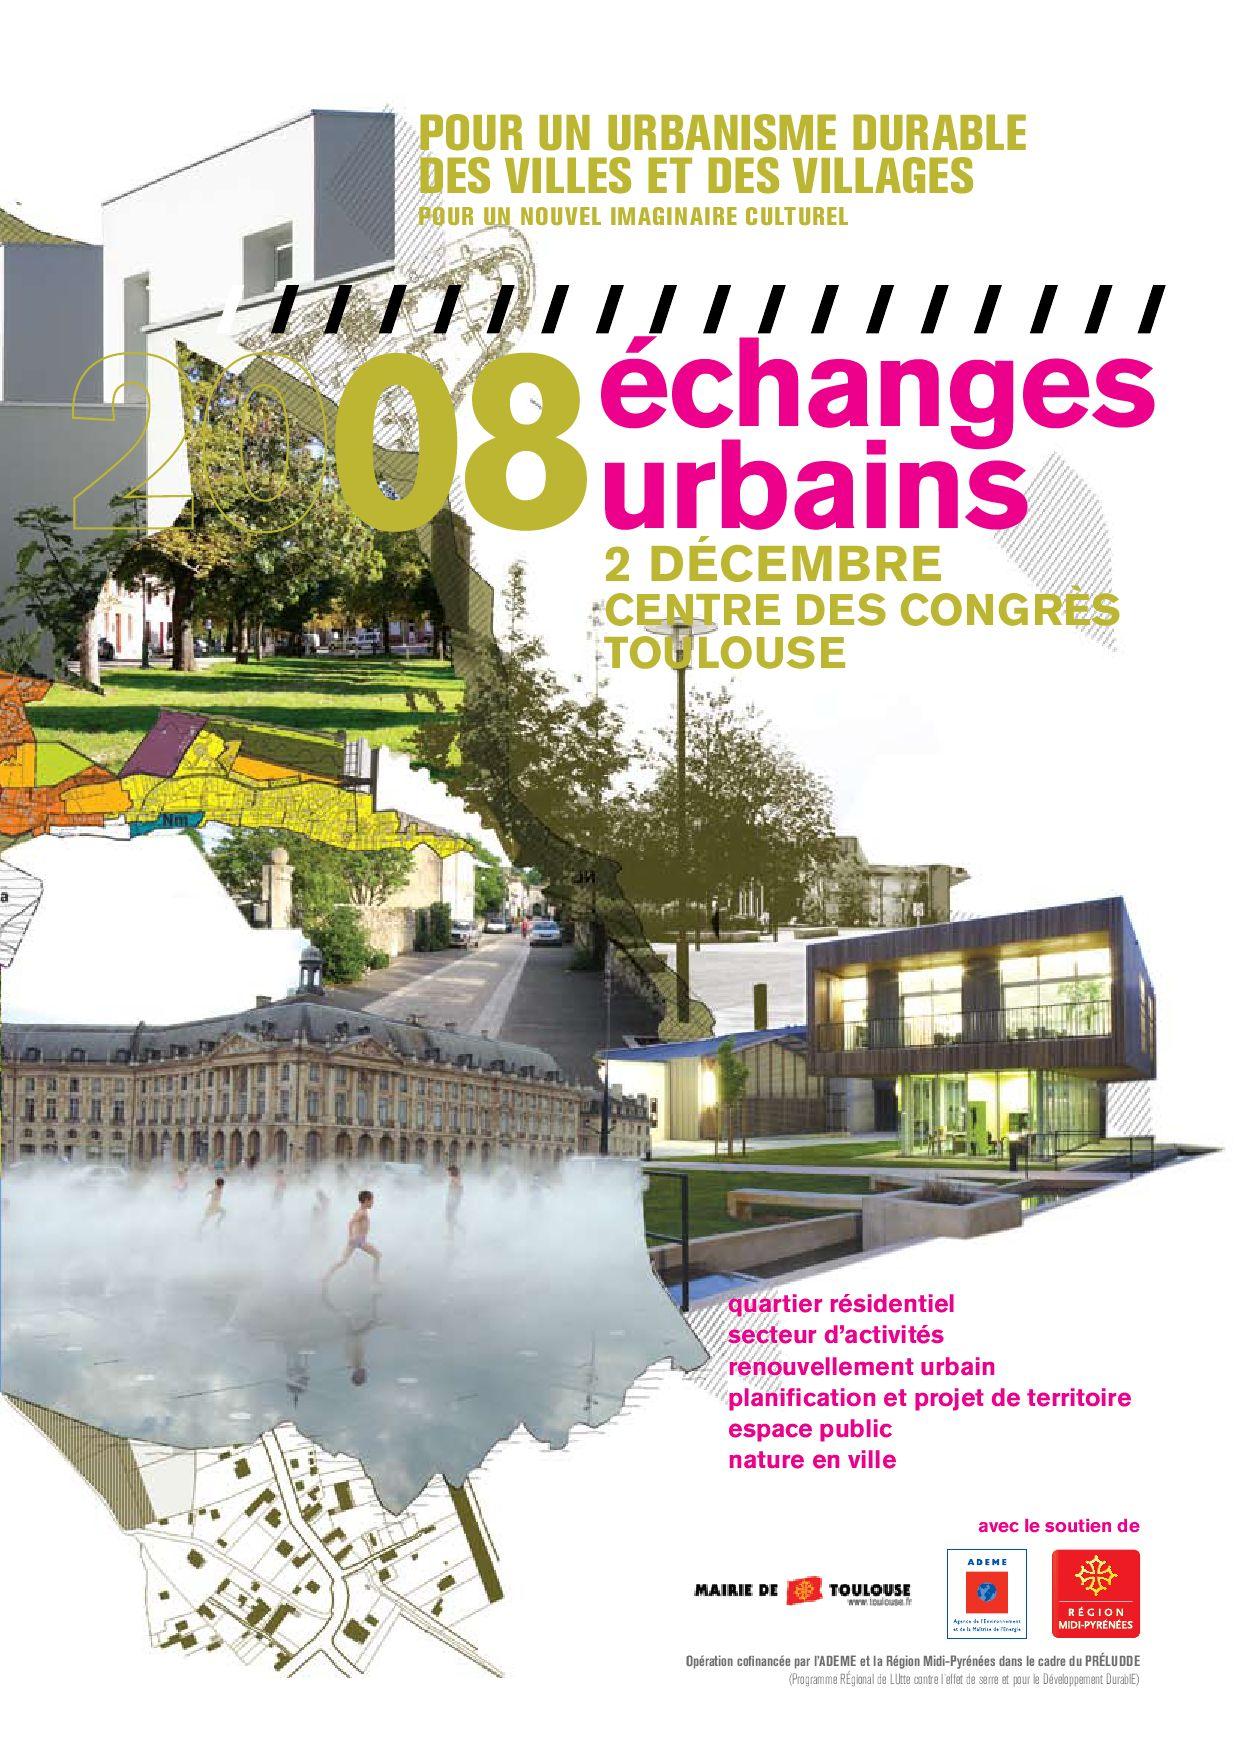 Rencontres urbanisme durable